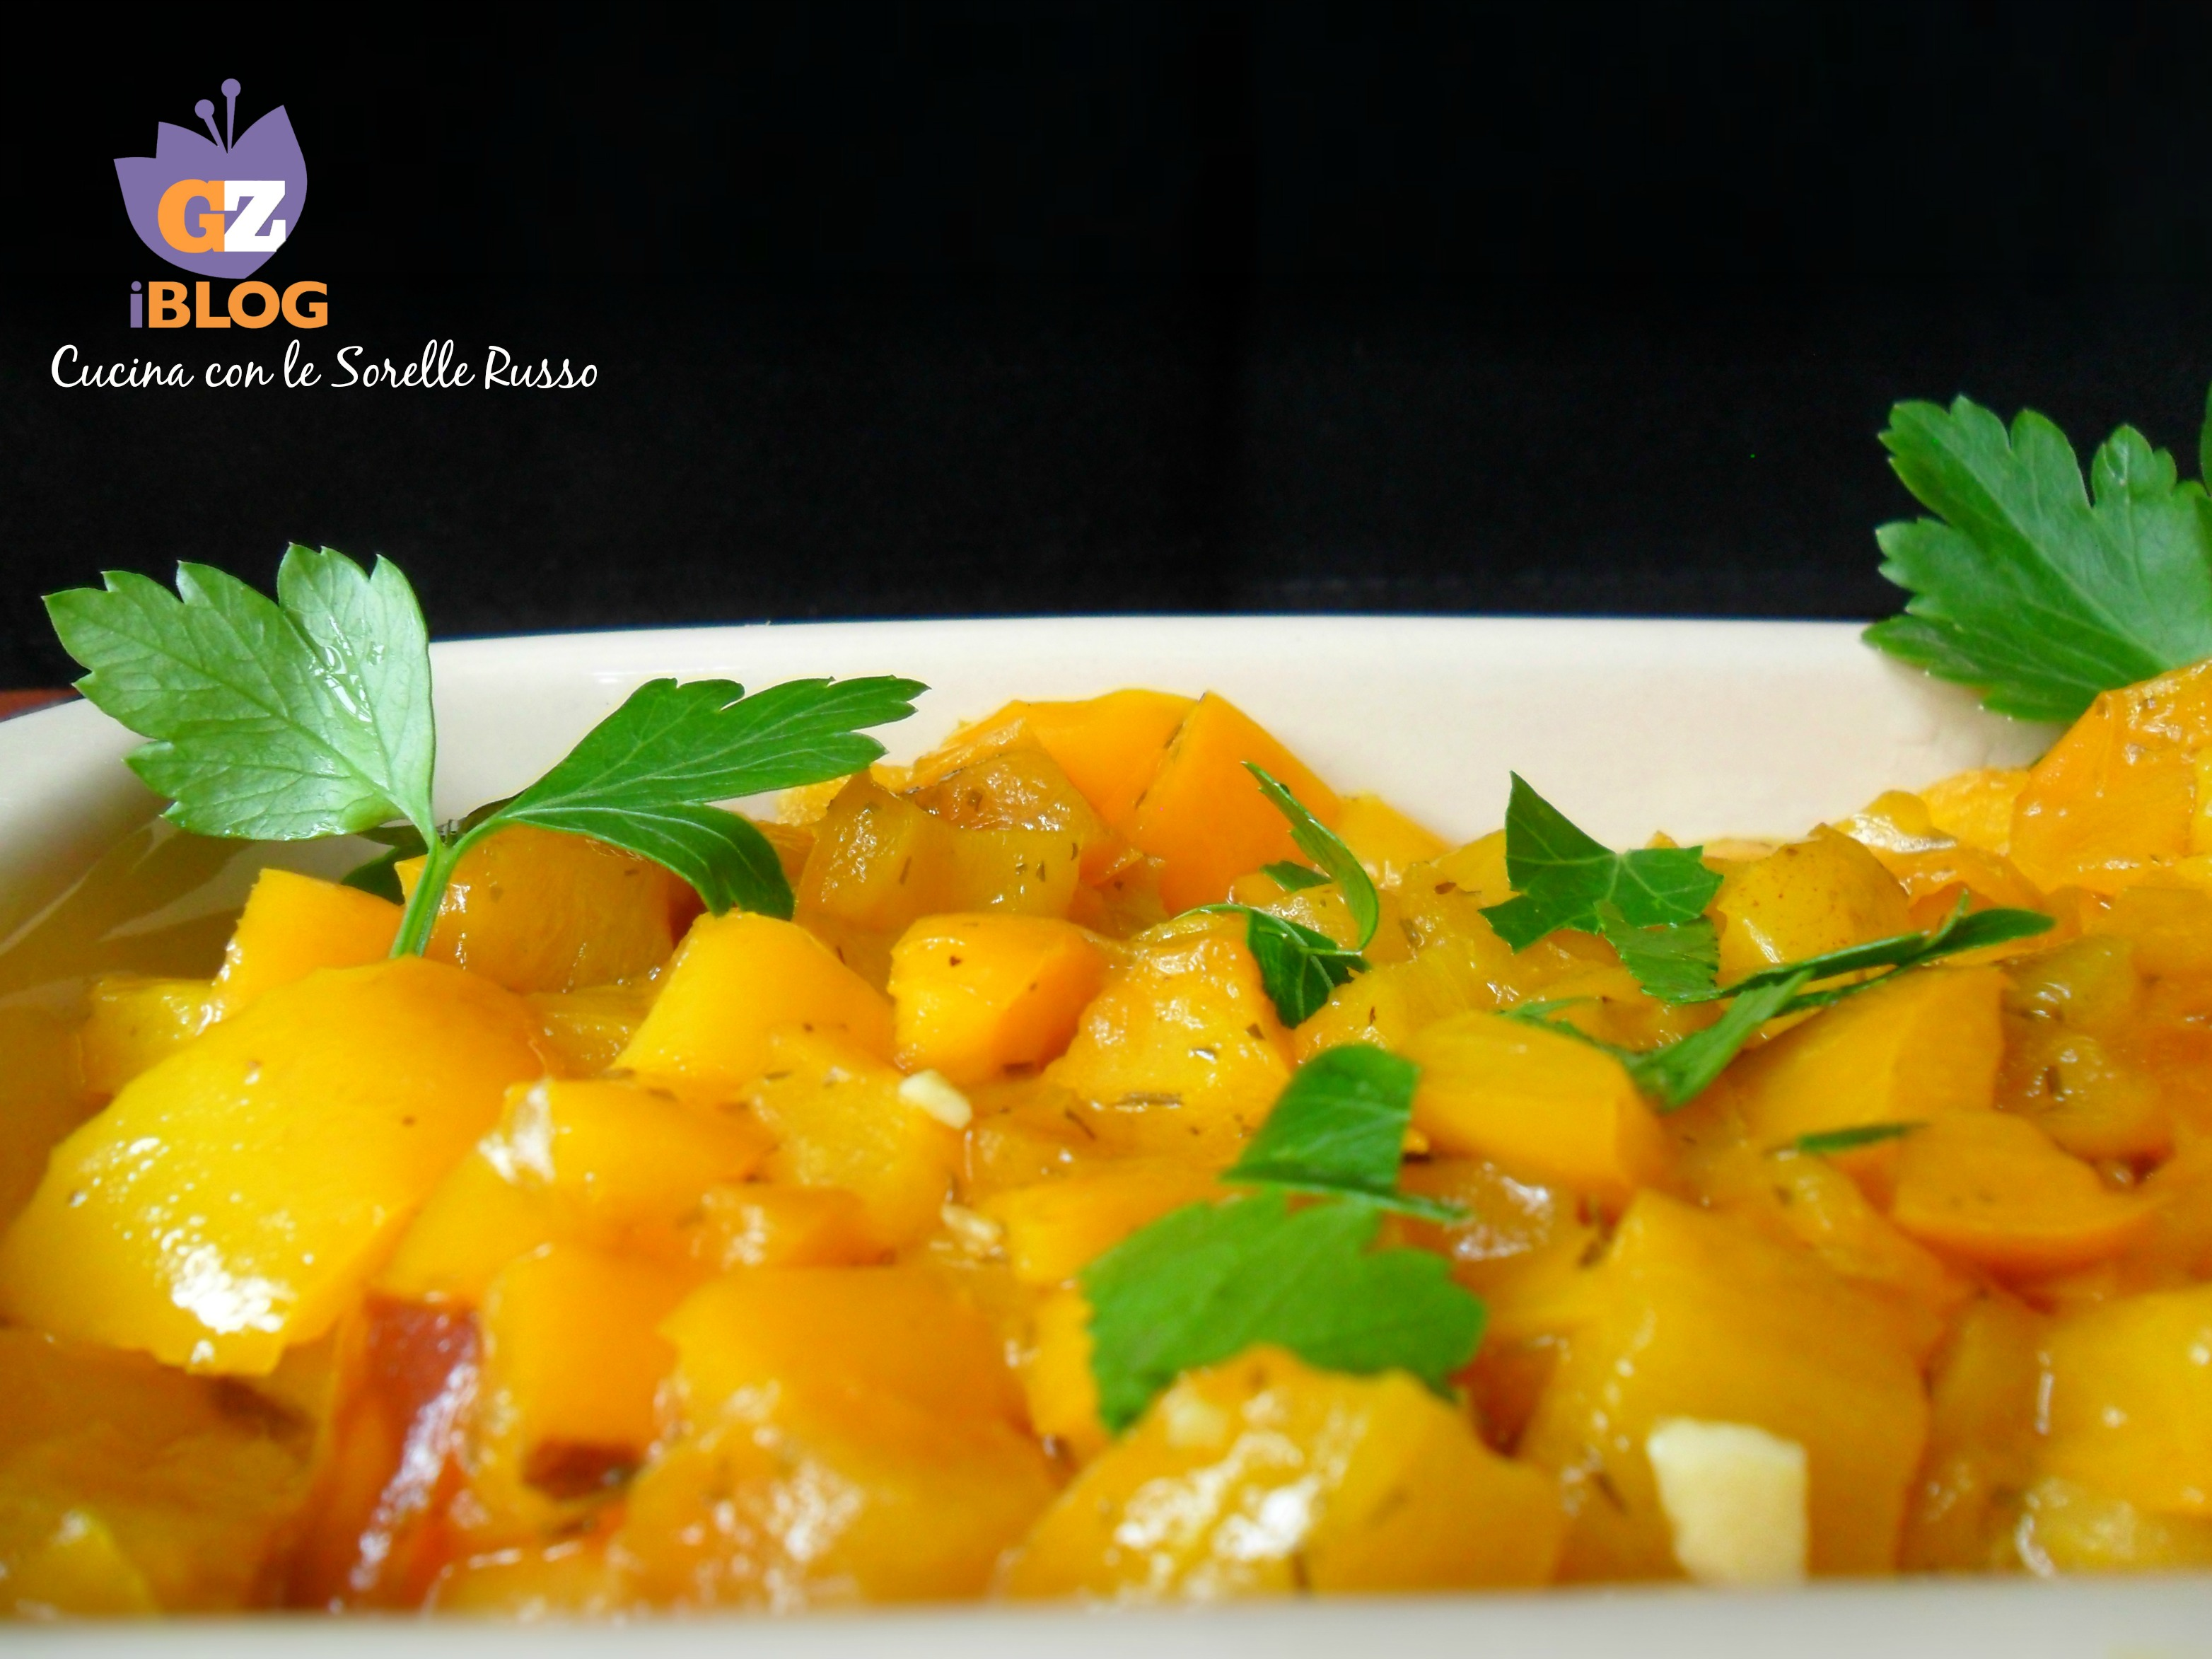 peperoni gialli fritti all'aglio 3